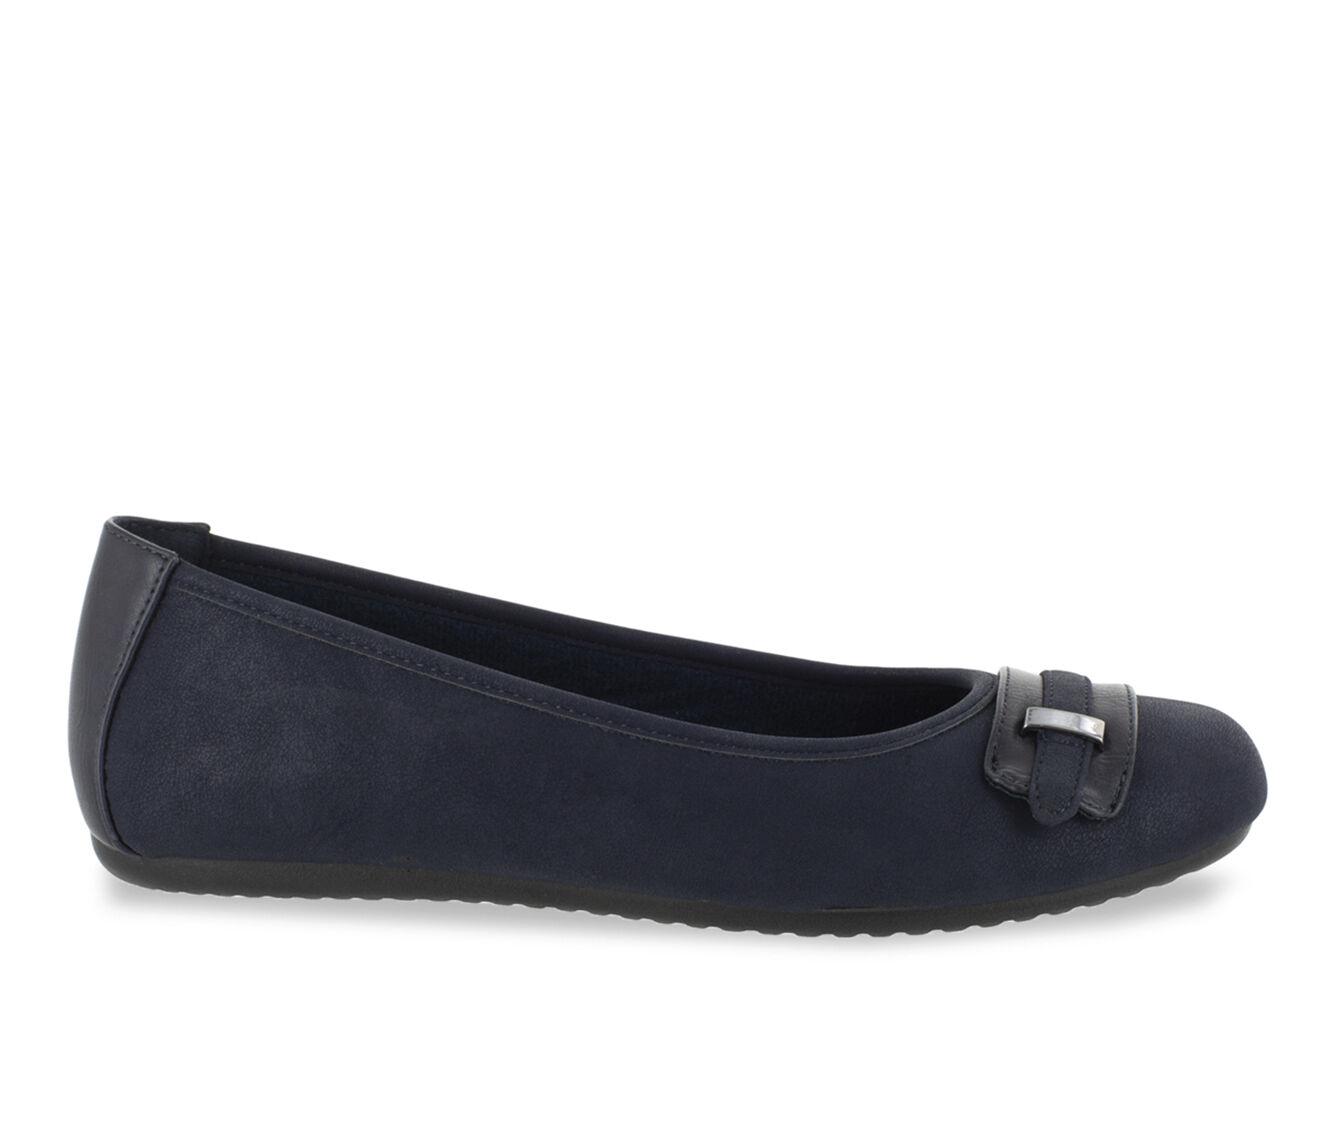 uk shoes_kd6054